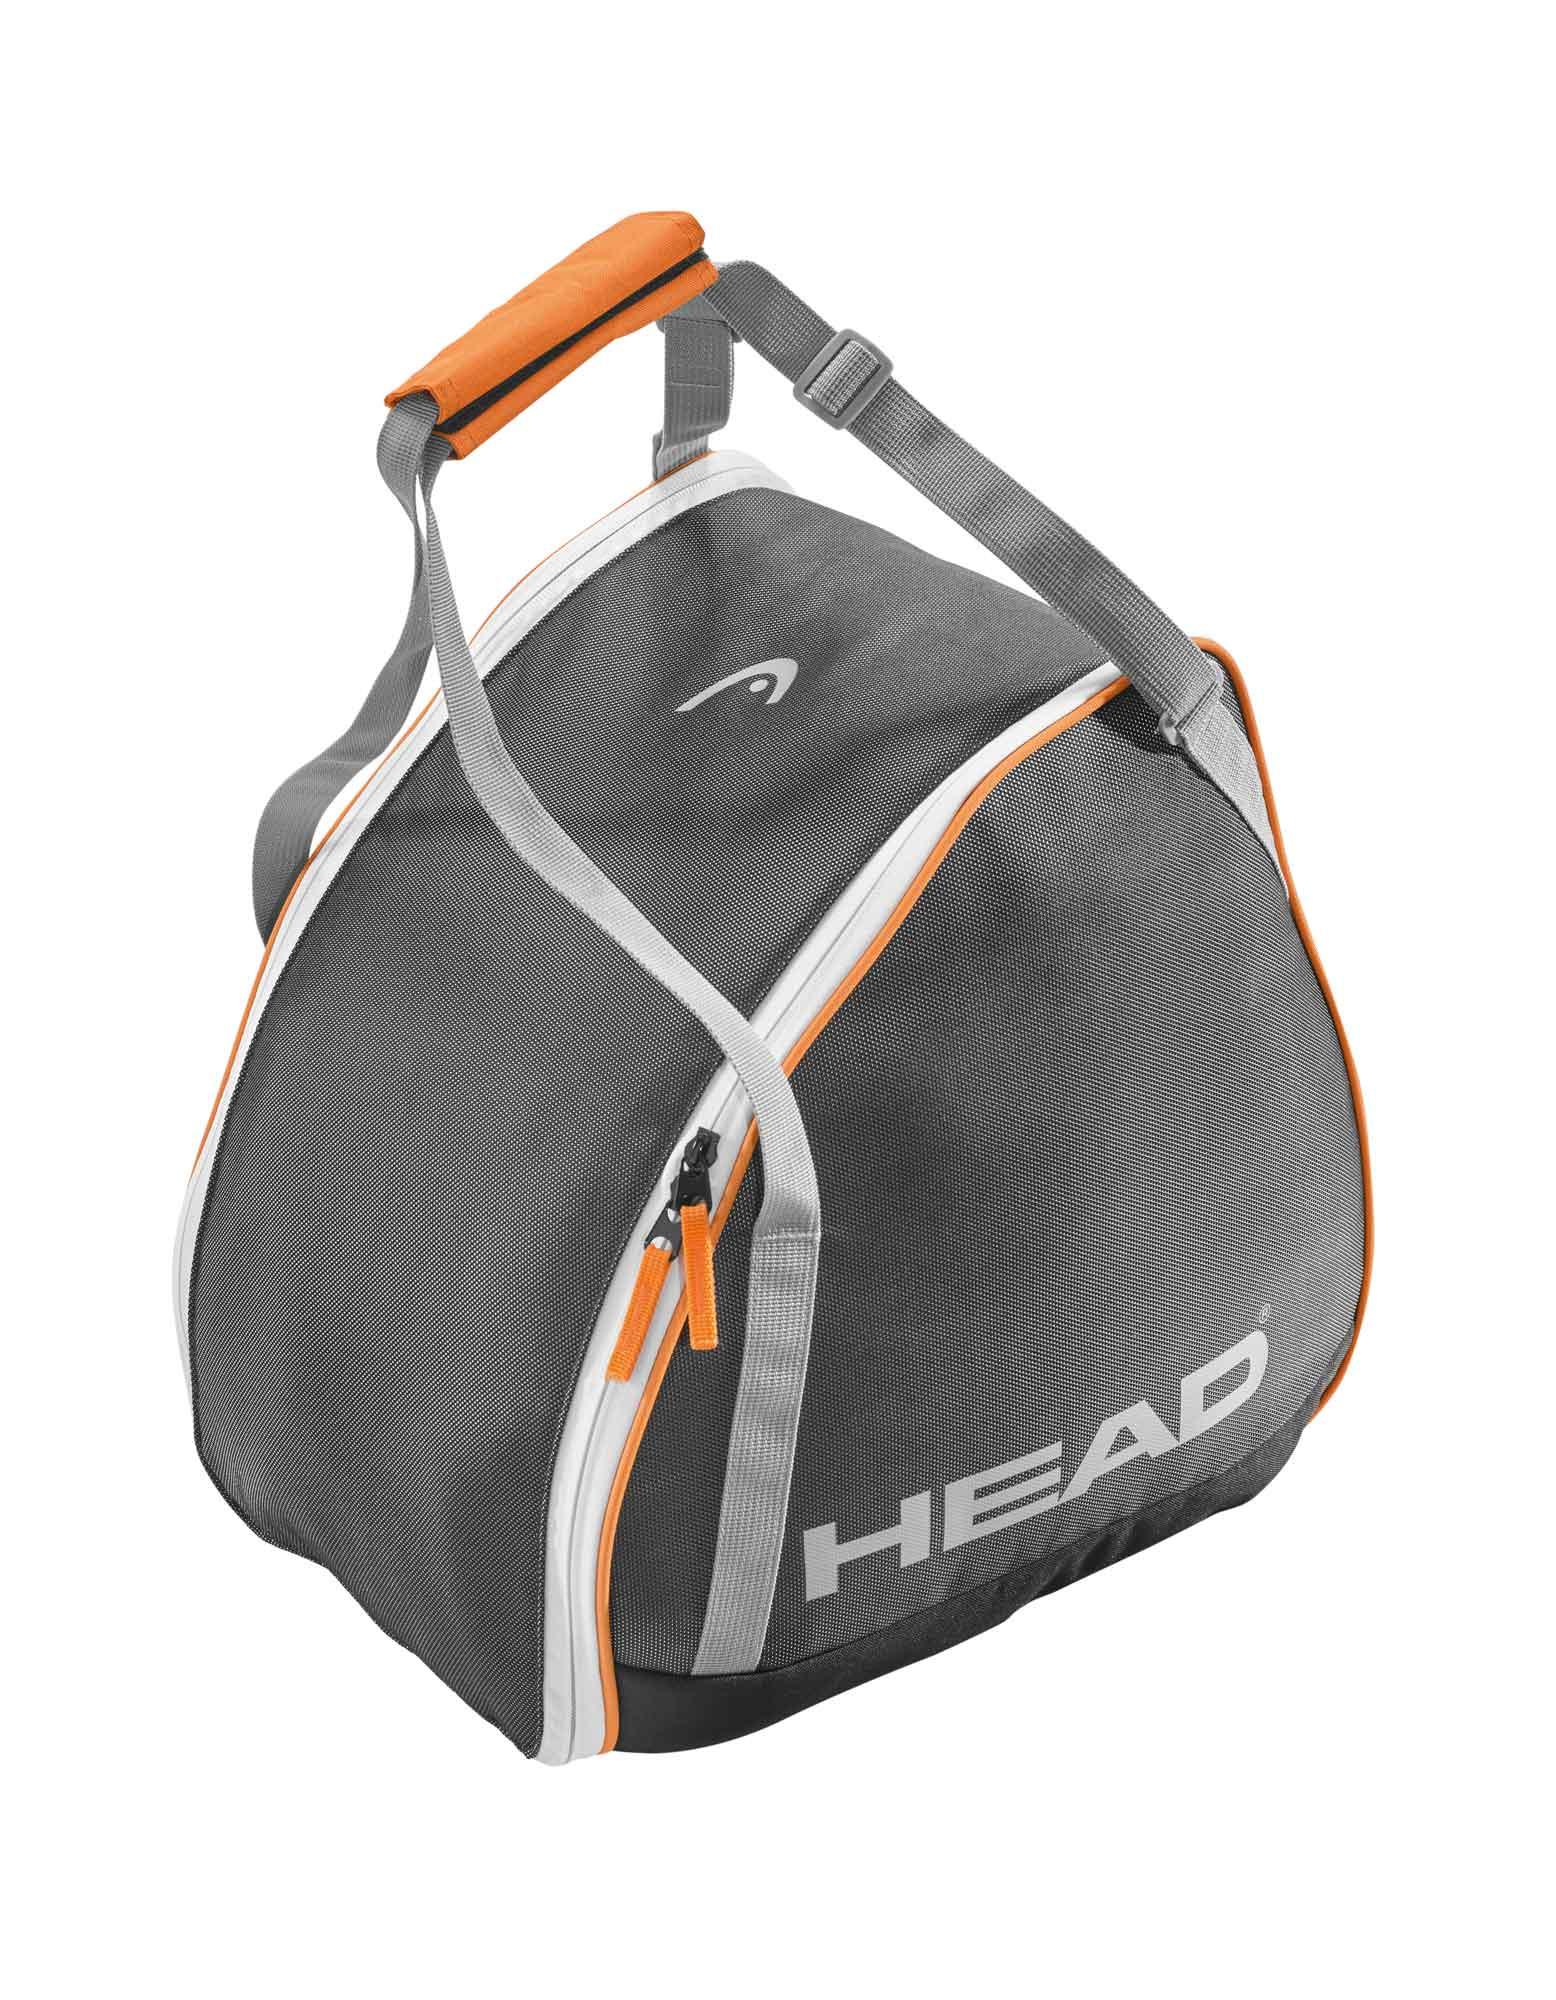 Head Boot Bag - Skischuhtasche mit neuartigem Öffnungssystem